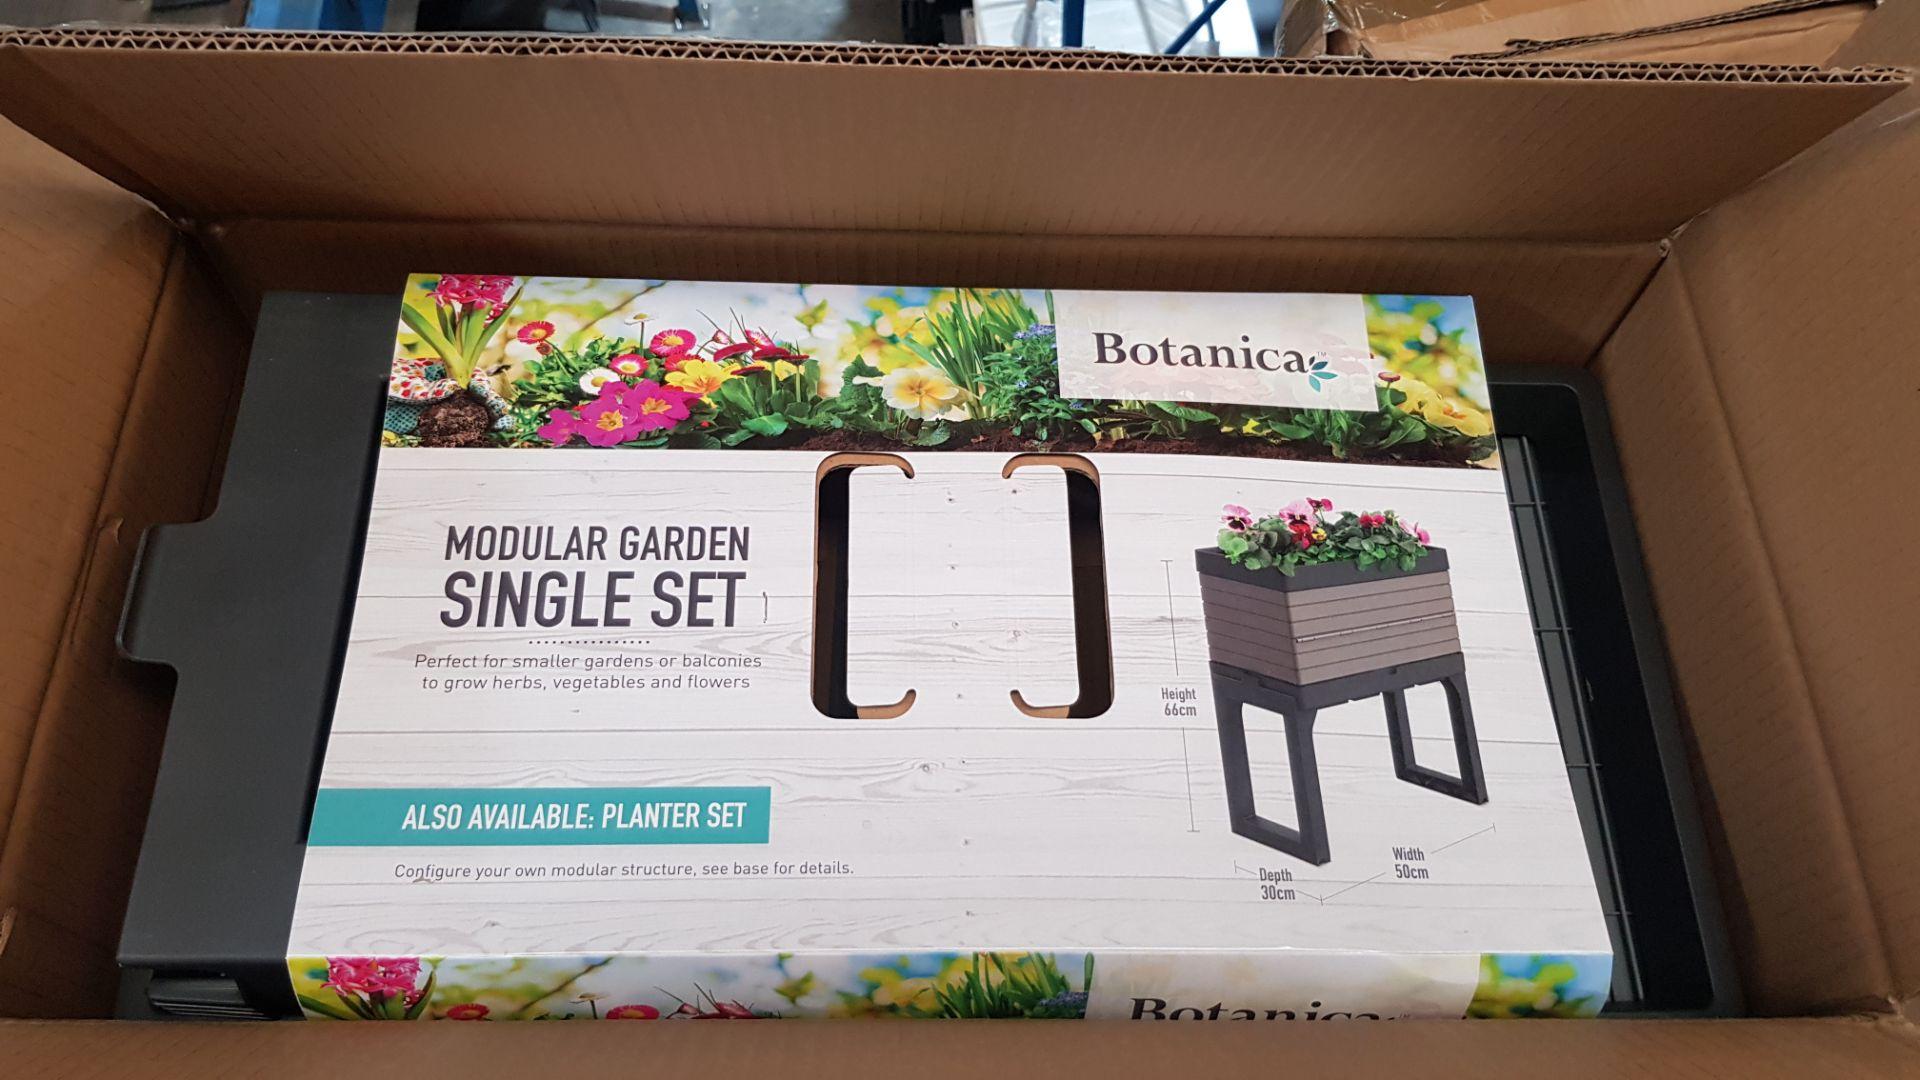 (P6) 2x Botanica Modular Garden Single Set Grey RRP £50 Each. New, Sealed Item. - Image 4 of 5